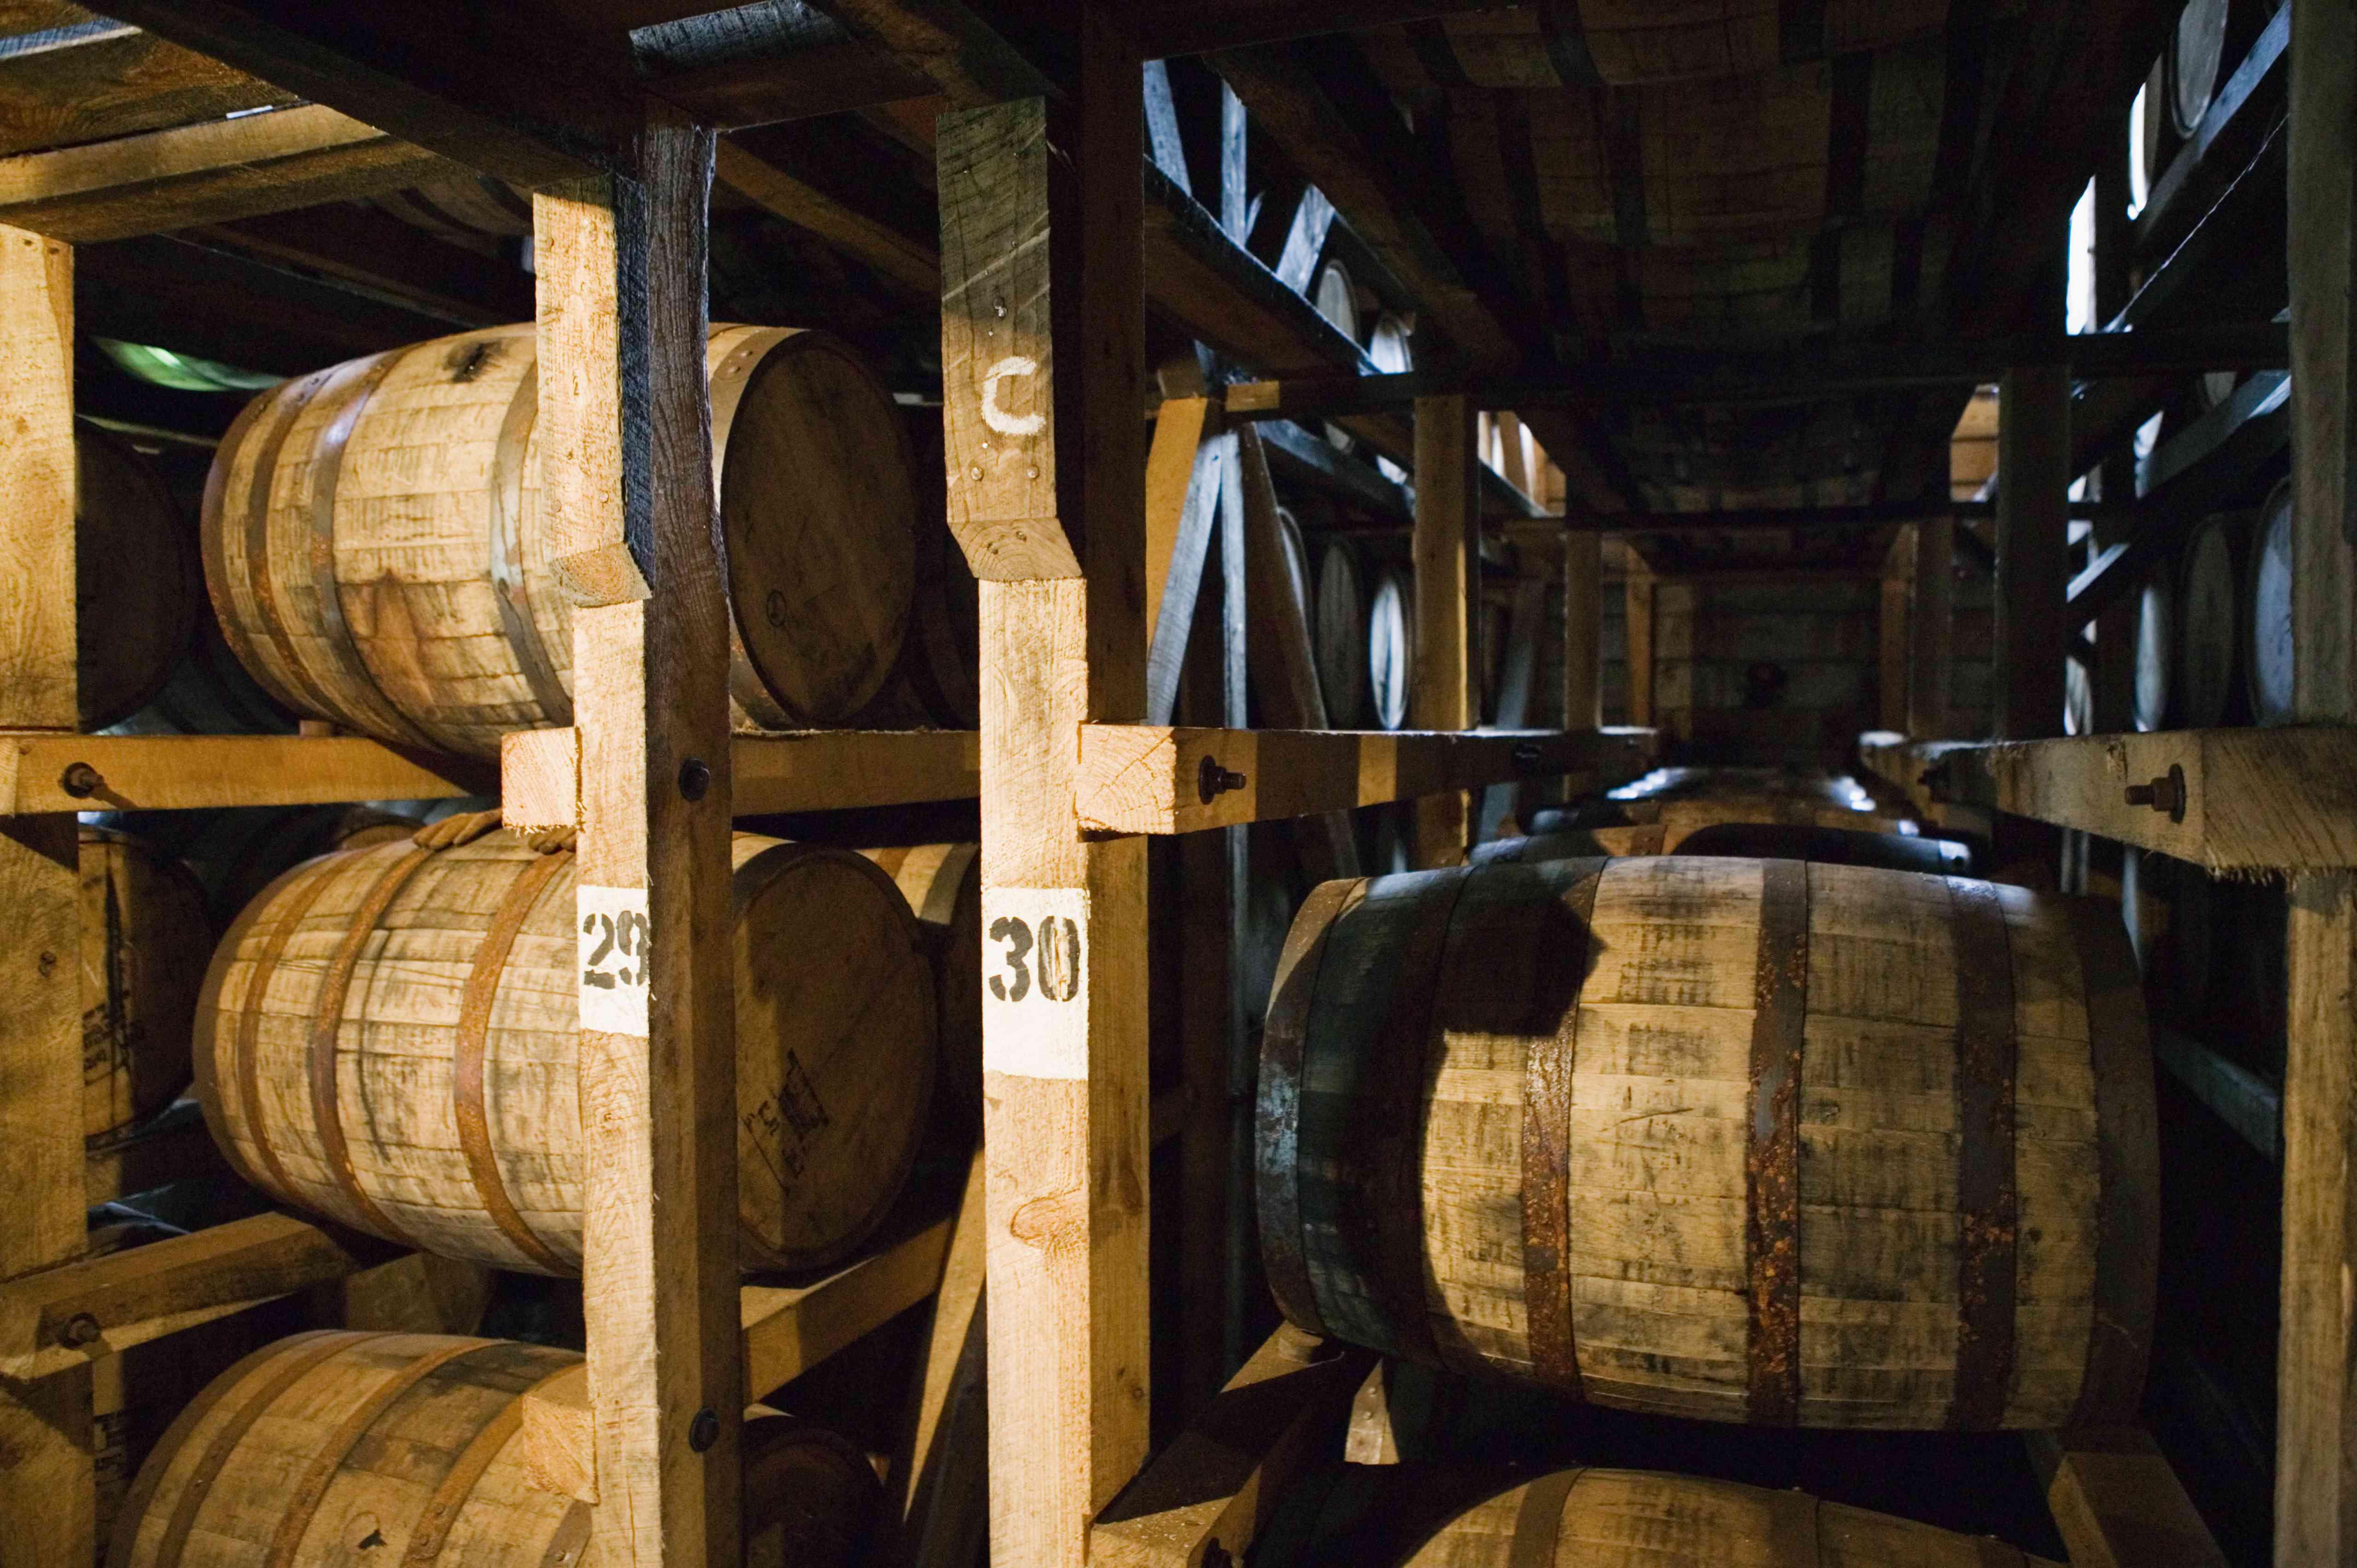 Aging bourbon in barrels, Maker's Mark Bourbon Distillery